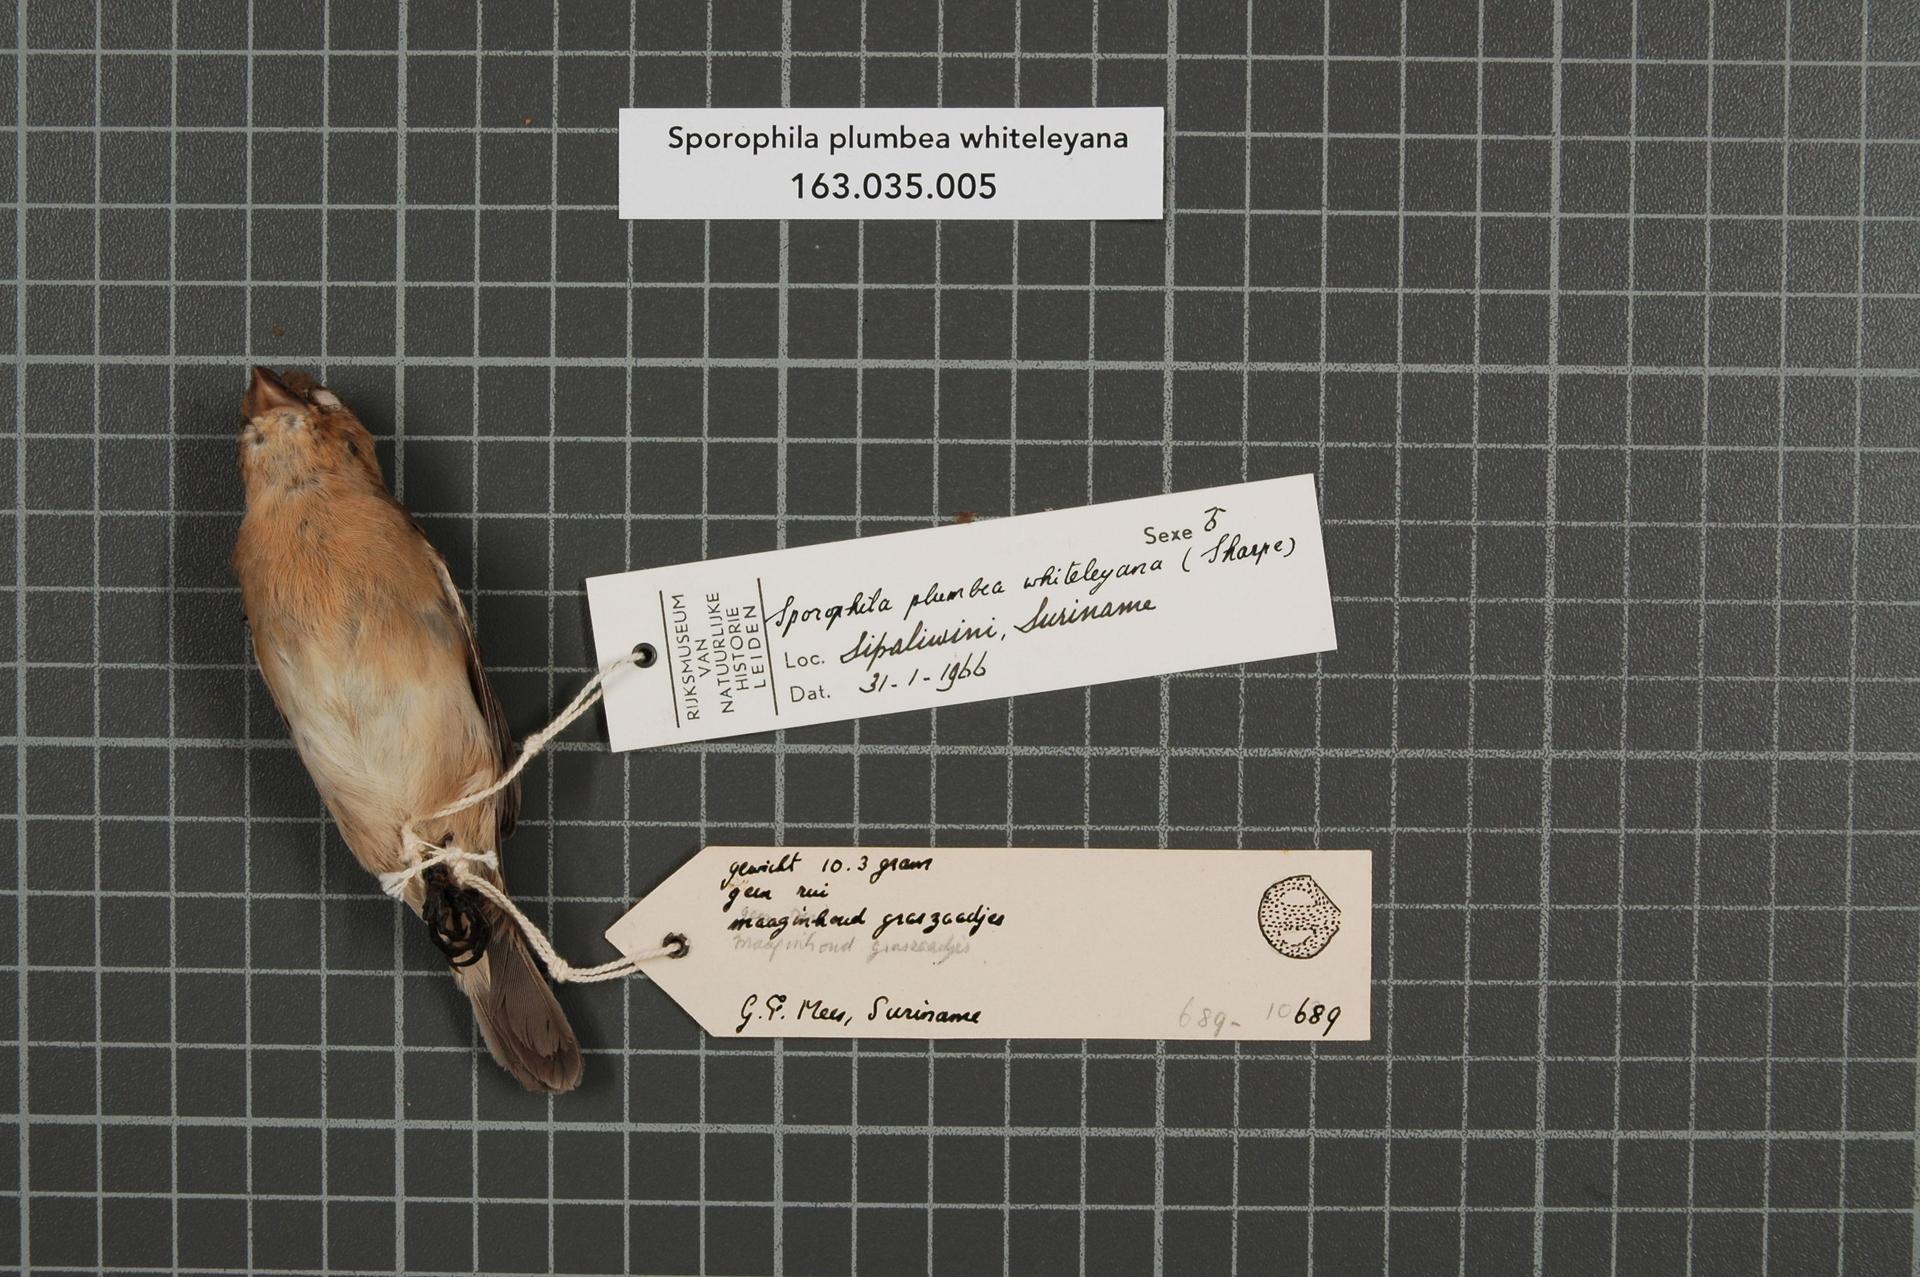 RMNH.AVES.39226 | Sporophila plumbea whiteleyana (Sharpe, 1888)